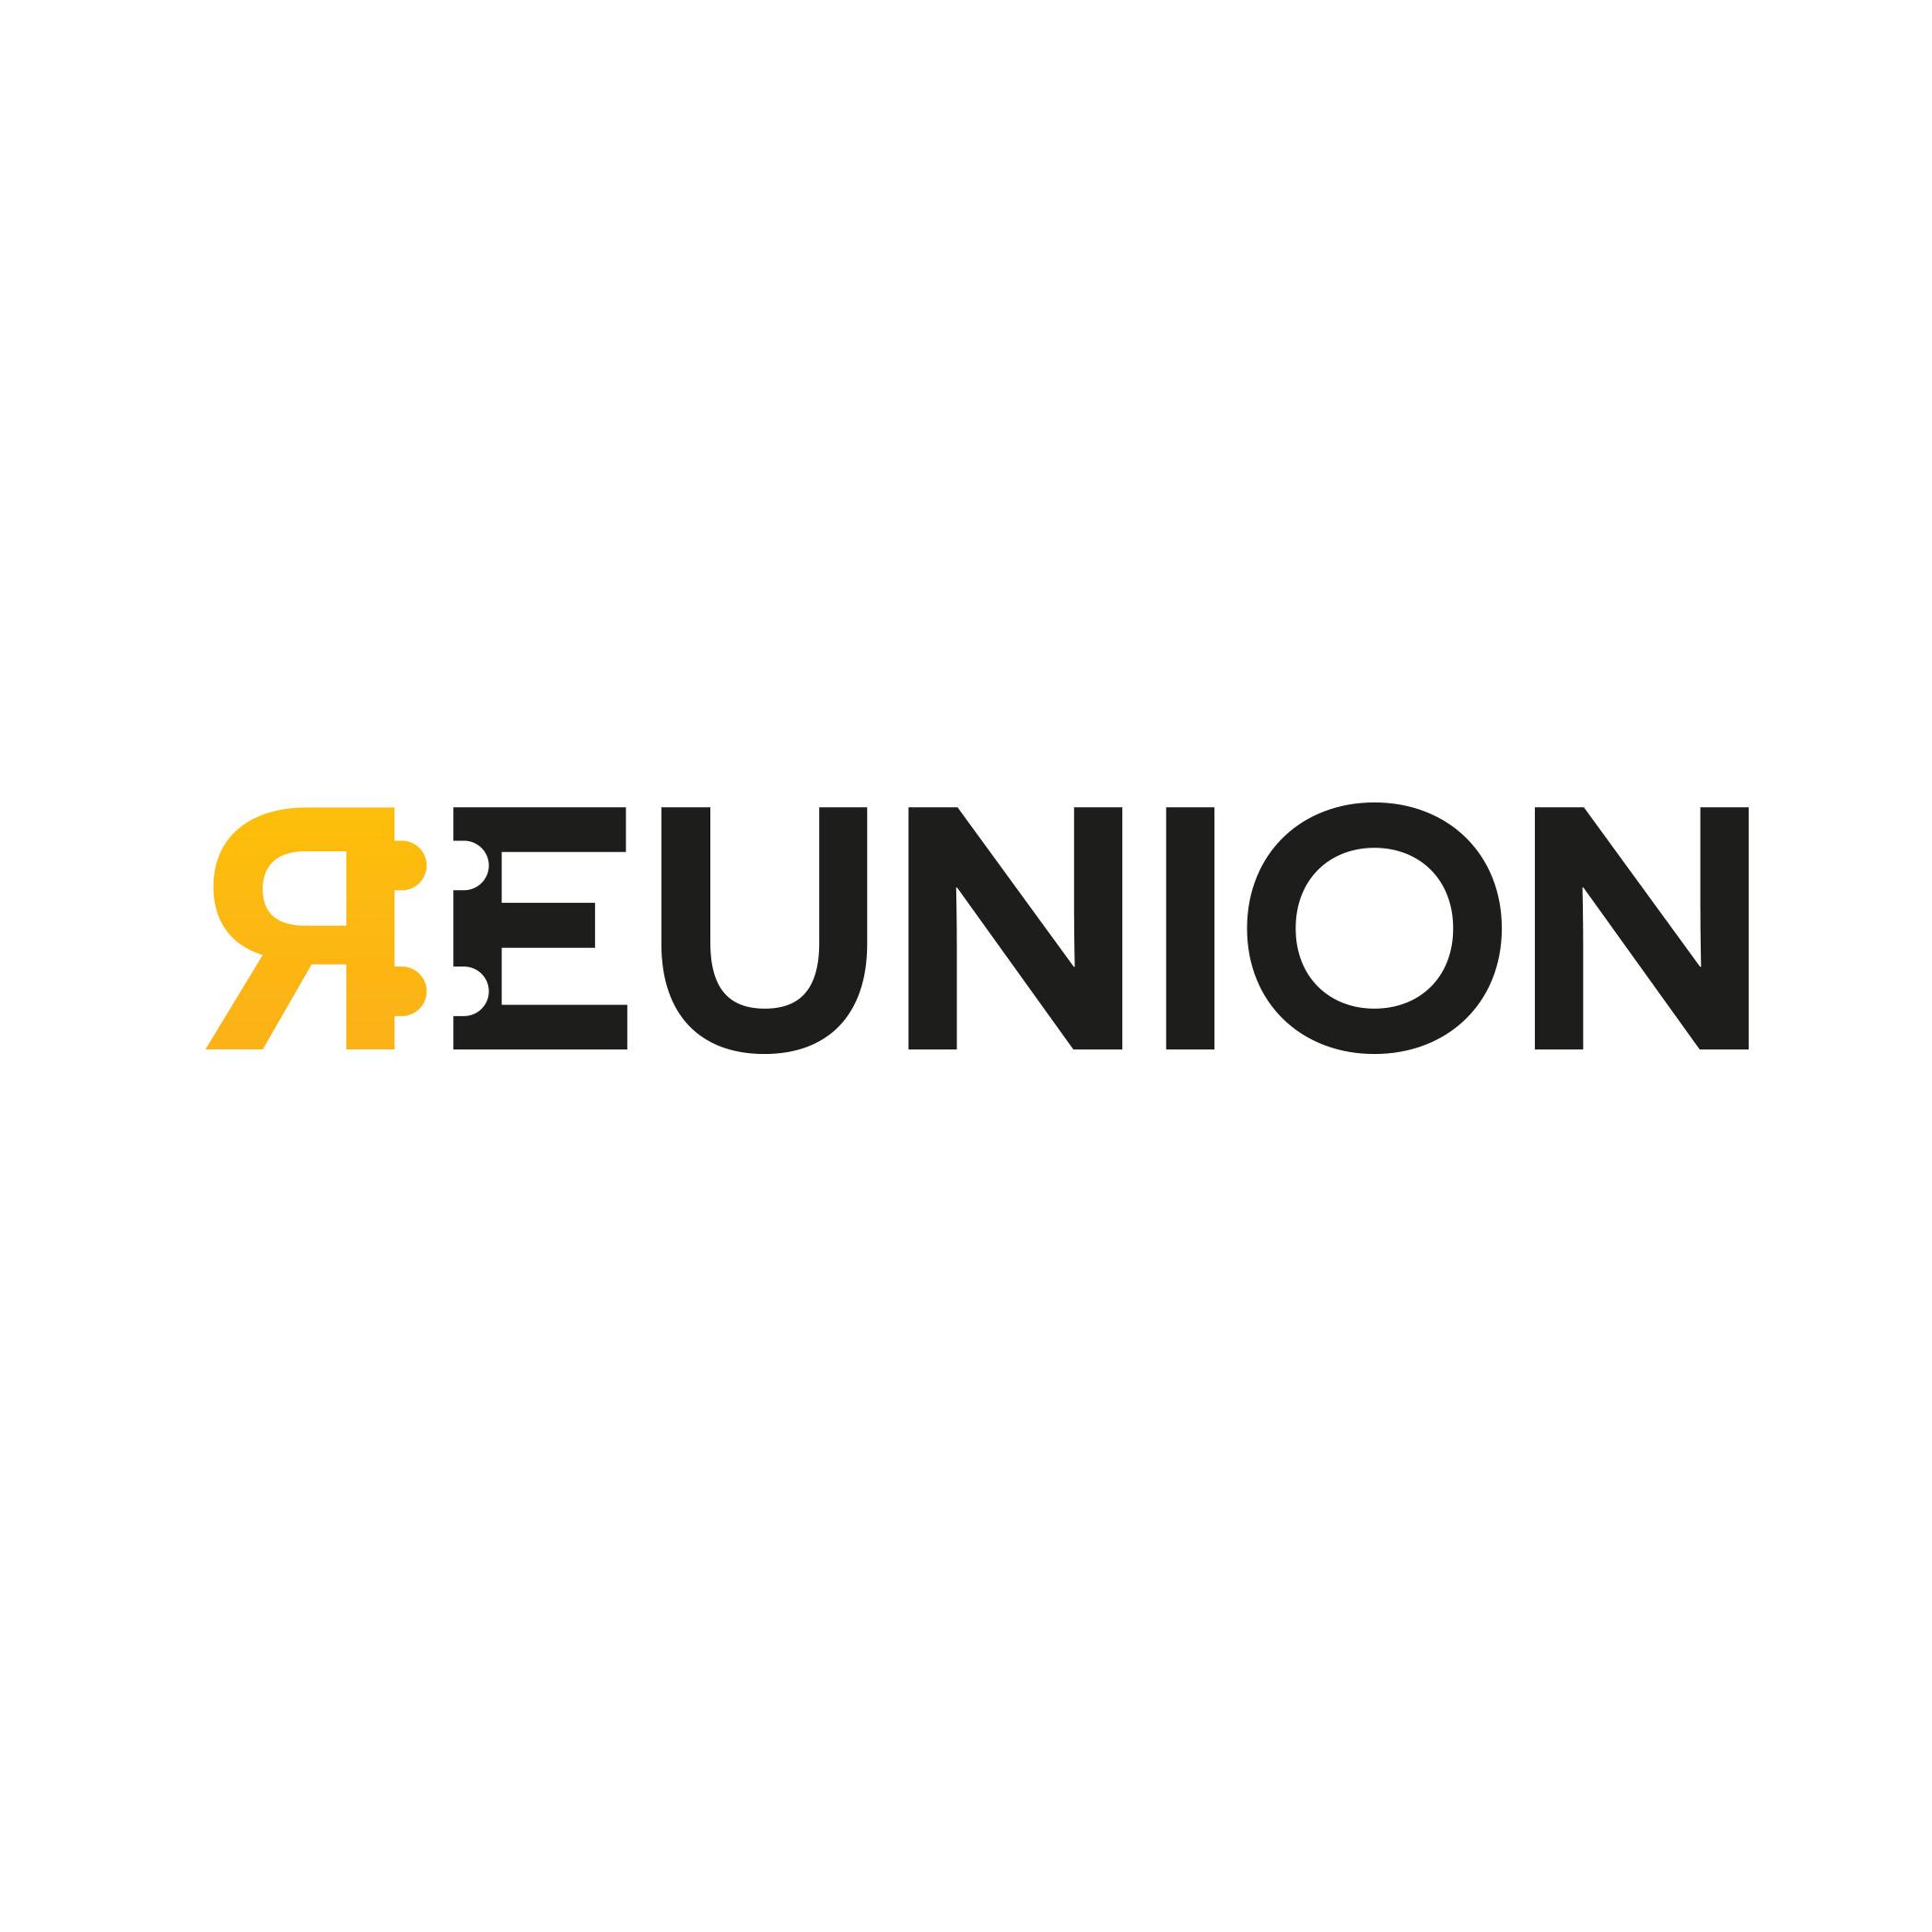 Proposta di logo per Reunion -  Starbytes contest